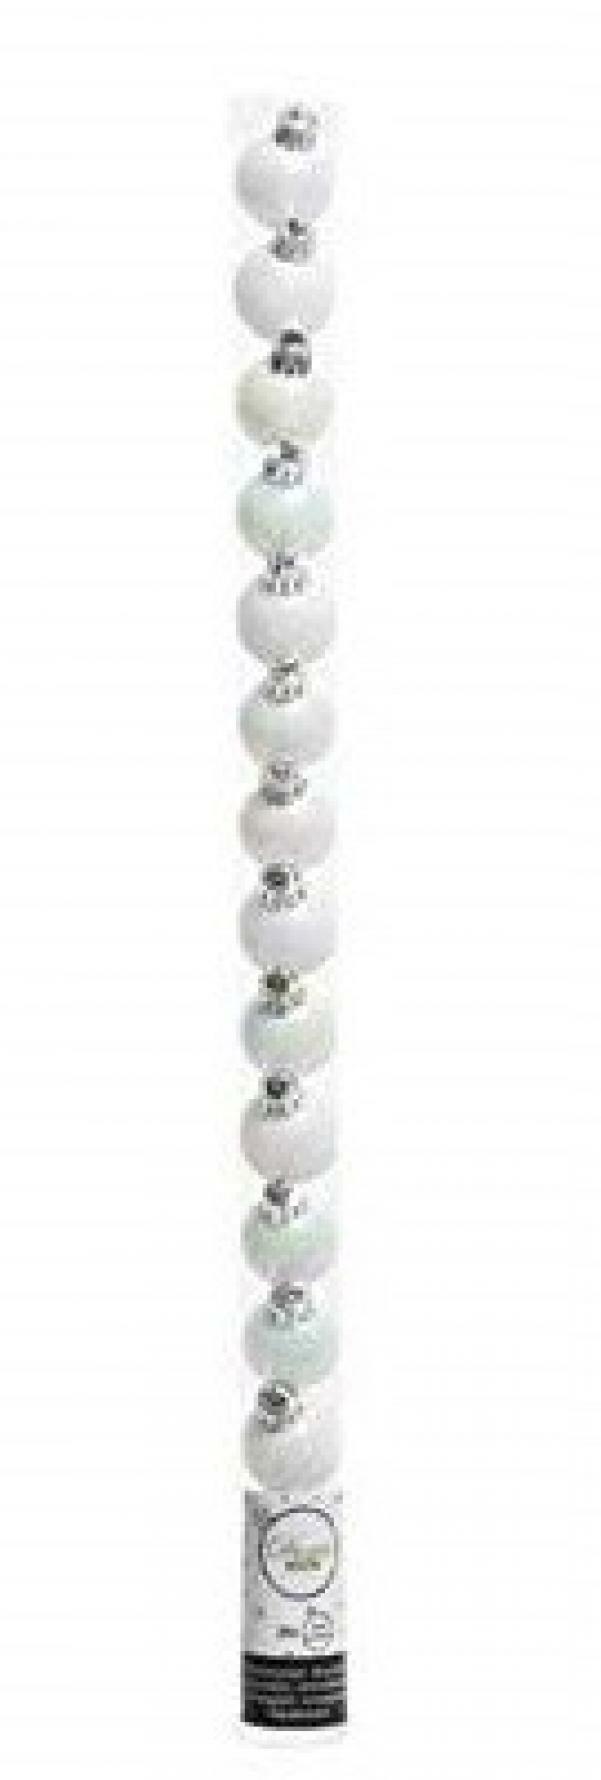 kaemingk kaemingk 15 palle r 3 cm - colore bianco perla